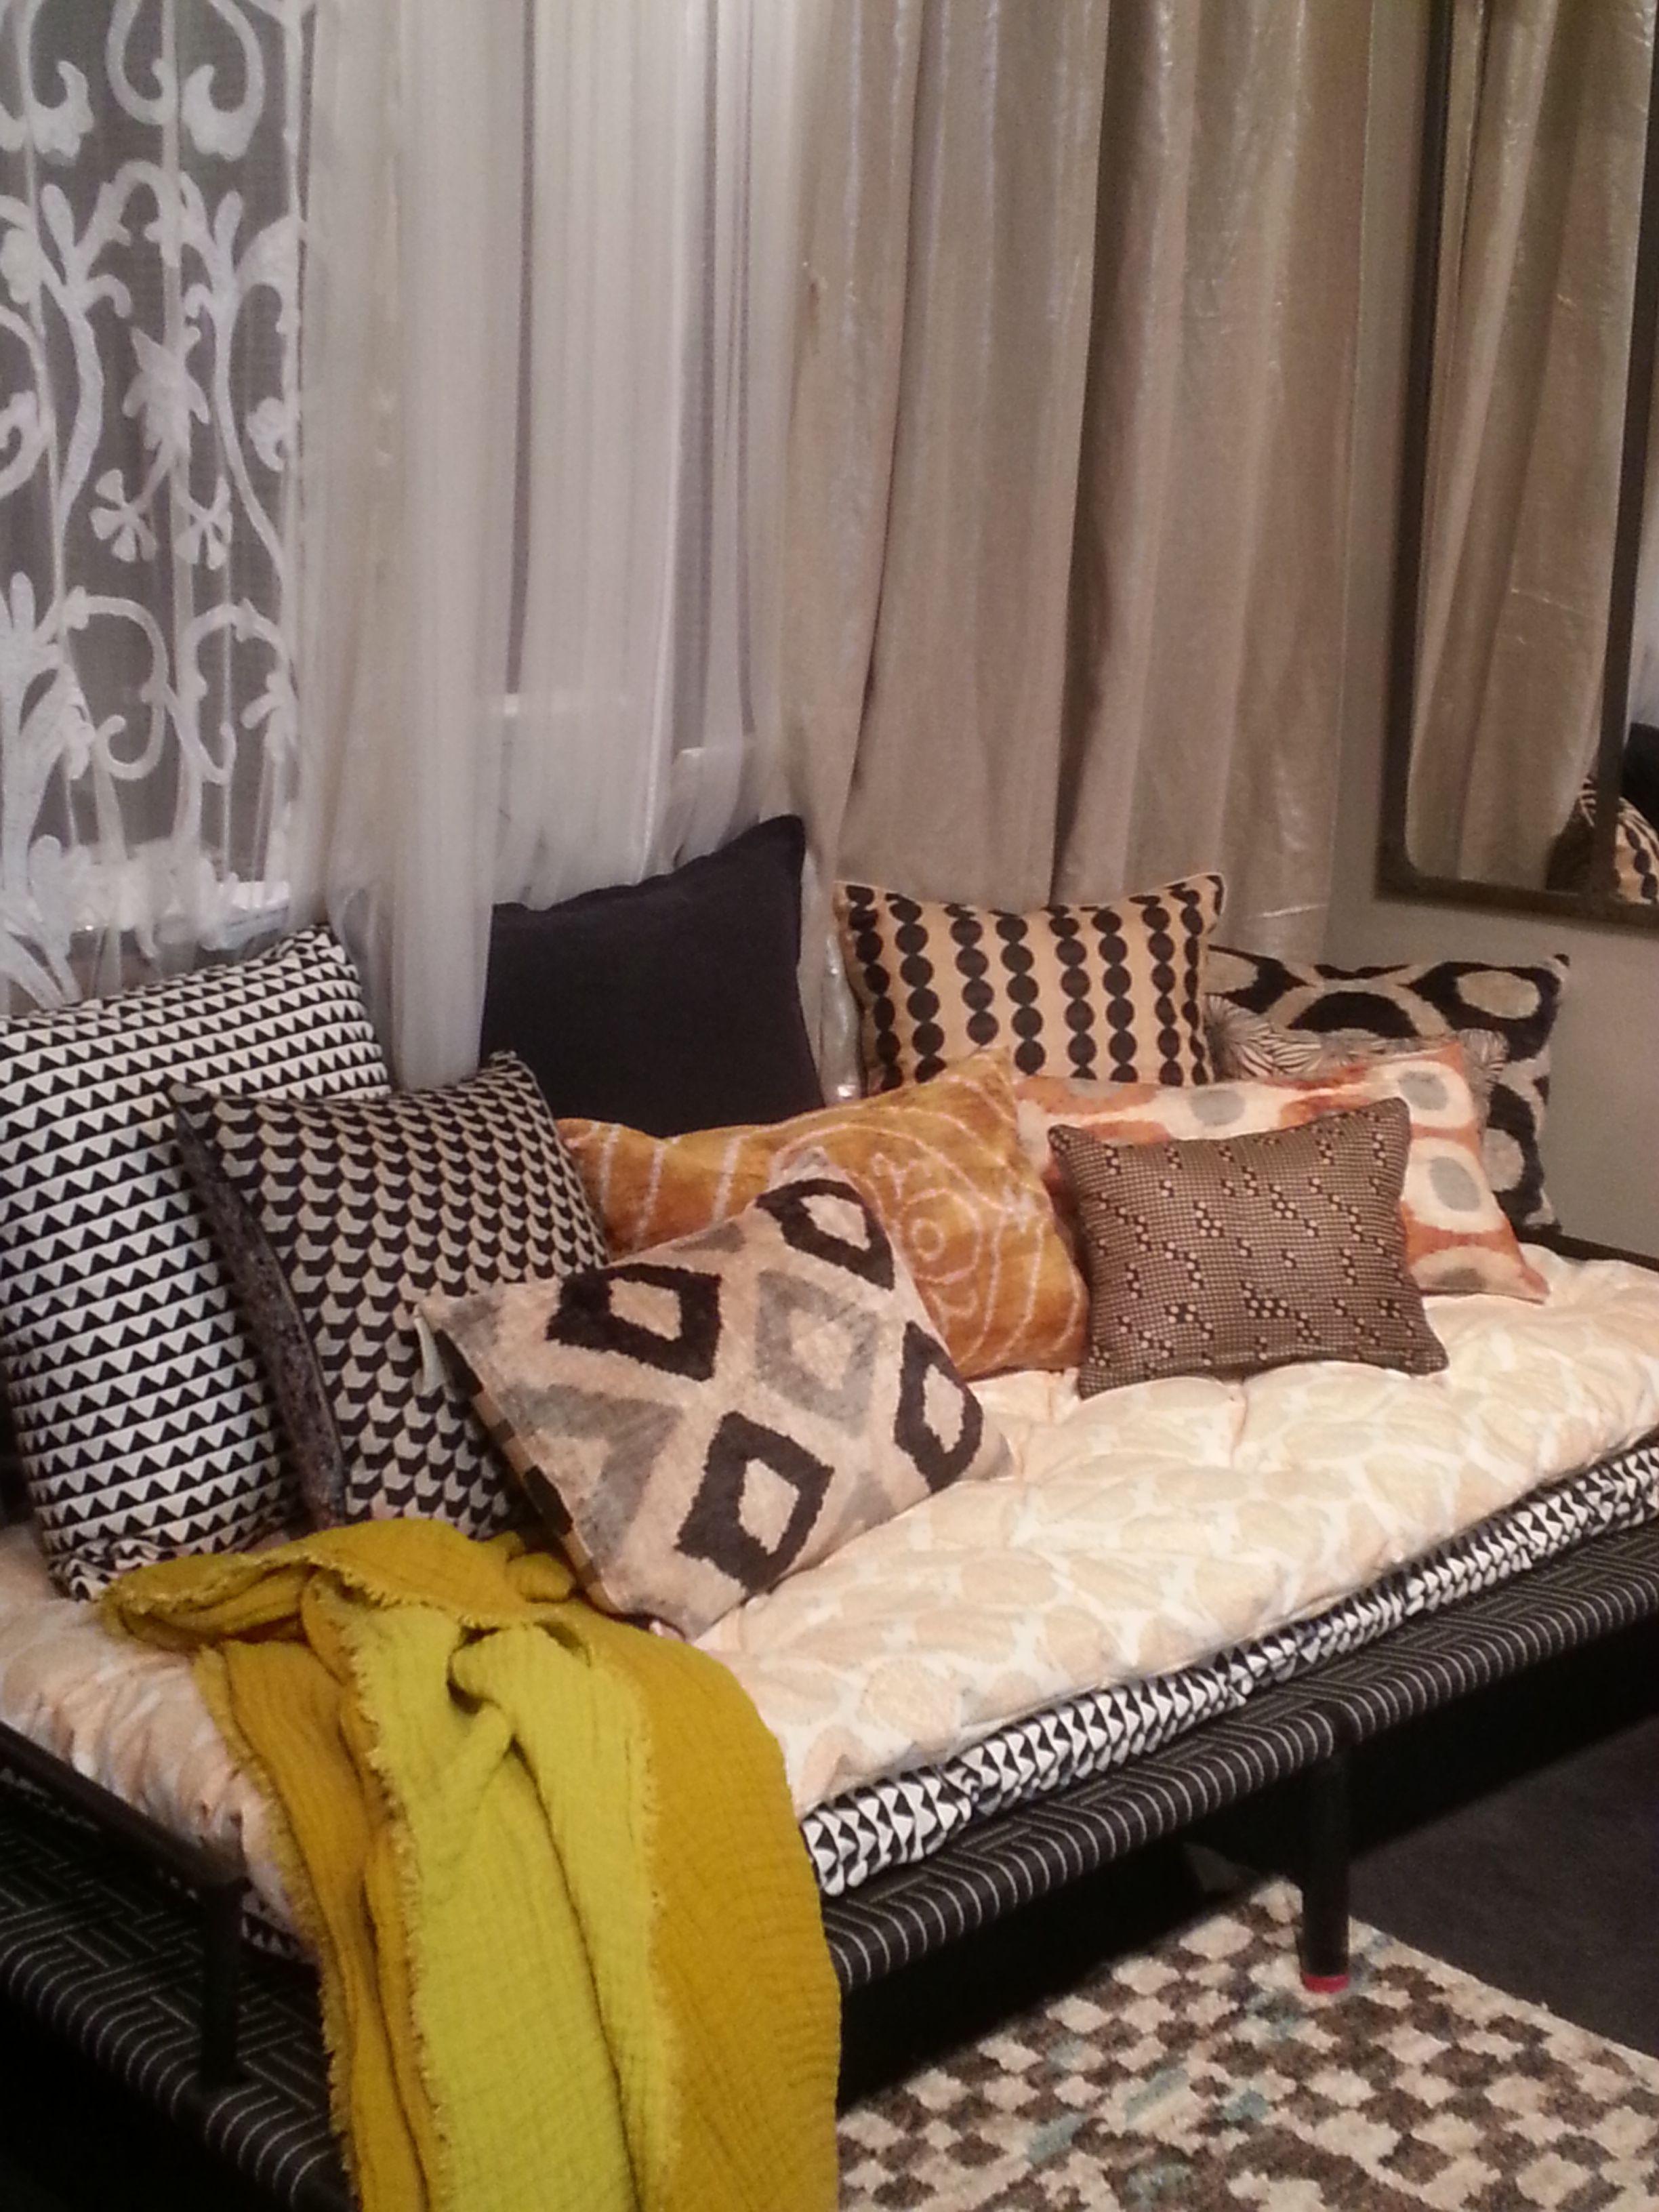 charpo et matelas imprim s le monde sauvage home pinterest monde sauvage matelas et sauvages. Black Bedroom Furniture Sets. Home Design Ideas